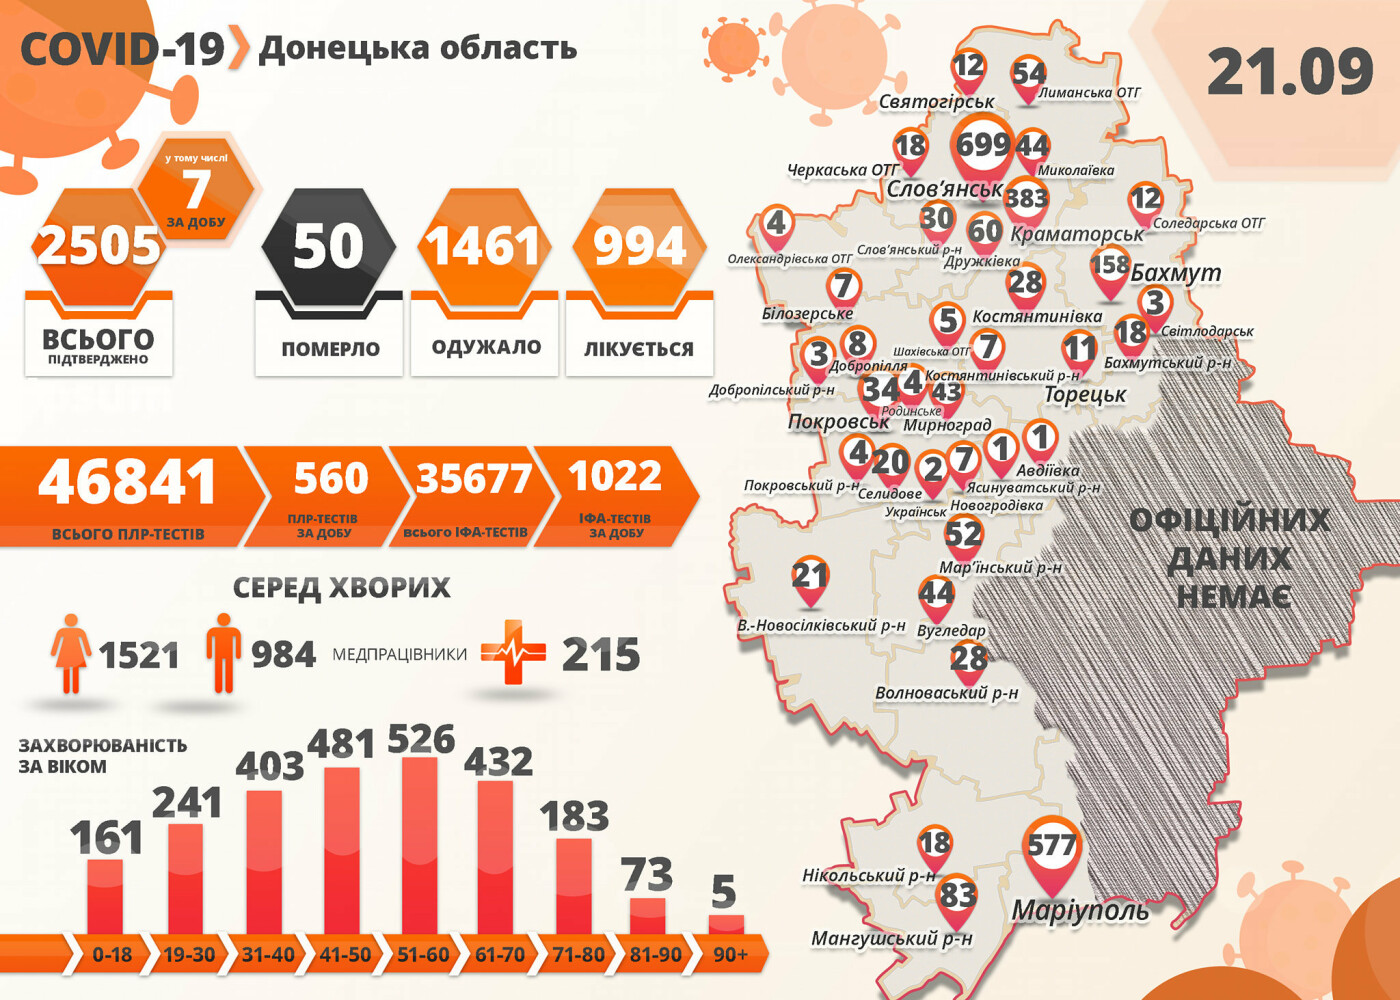 В Донецкой области от коронавируса за сутки умерли два человека, фото-1